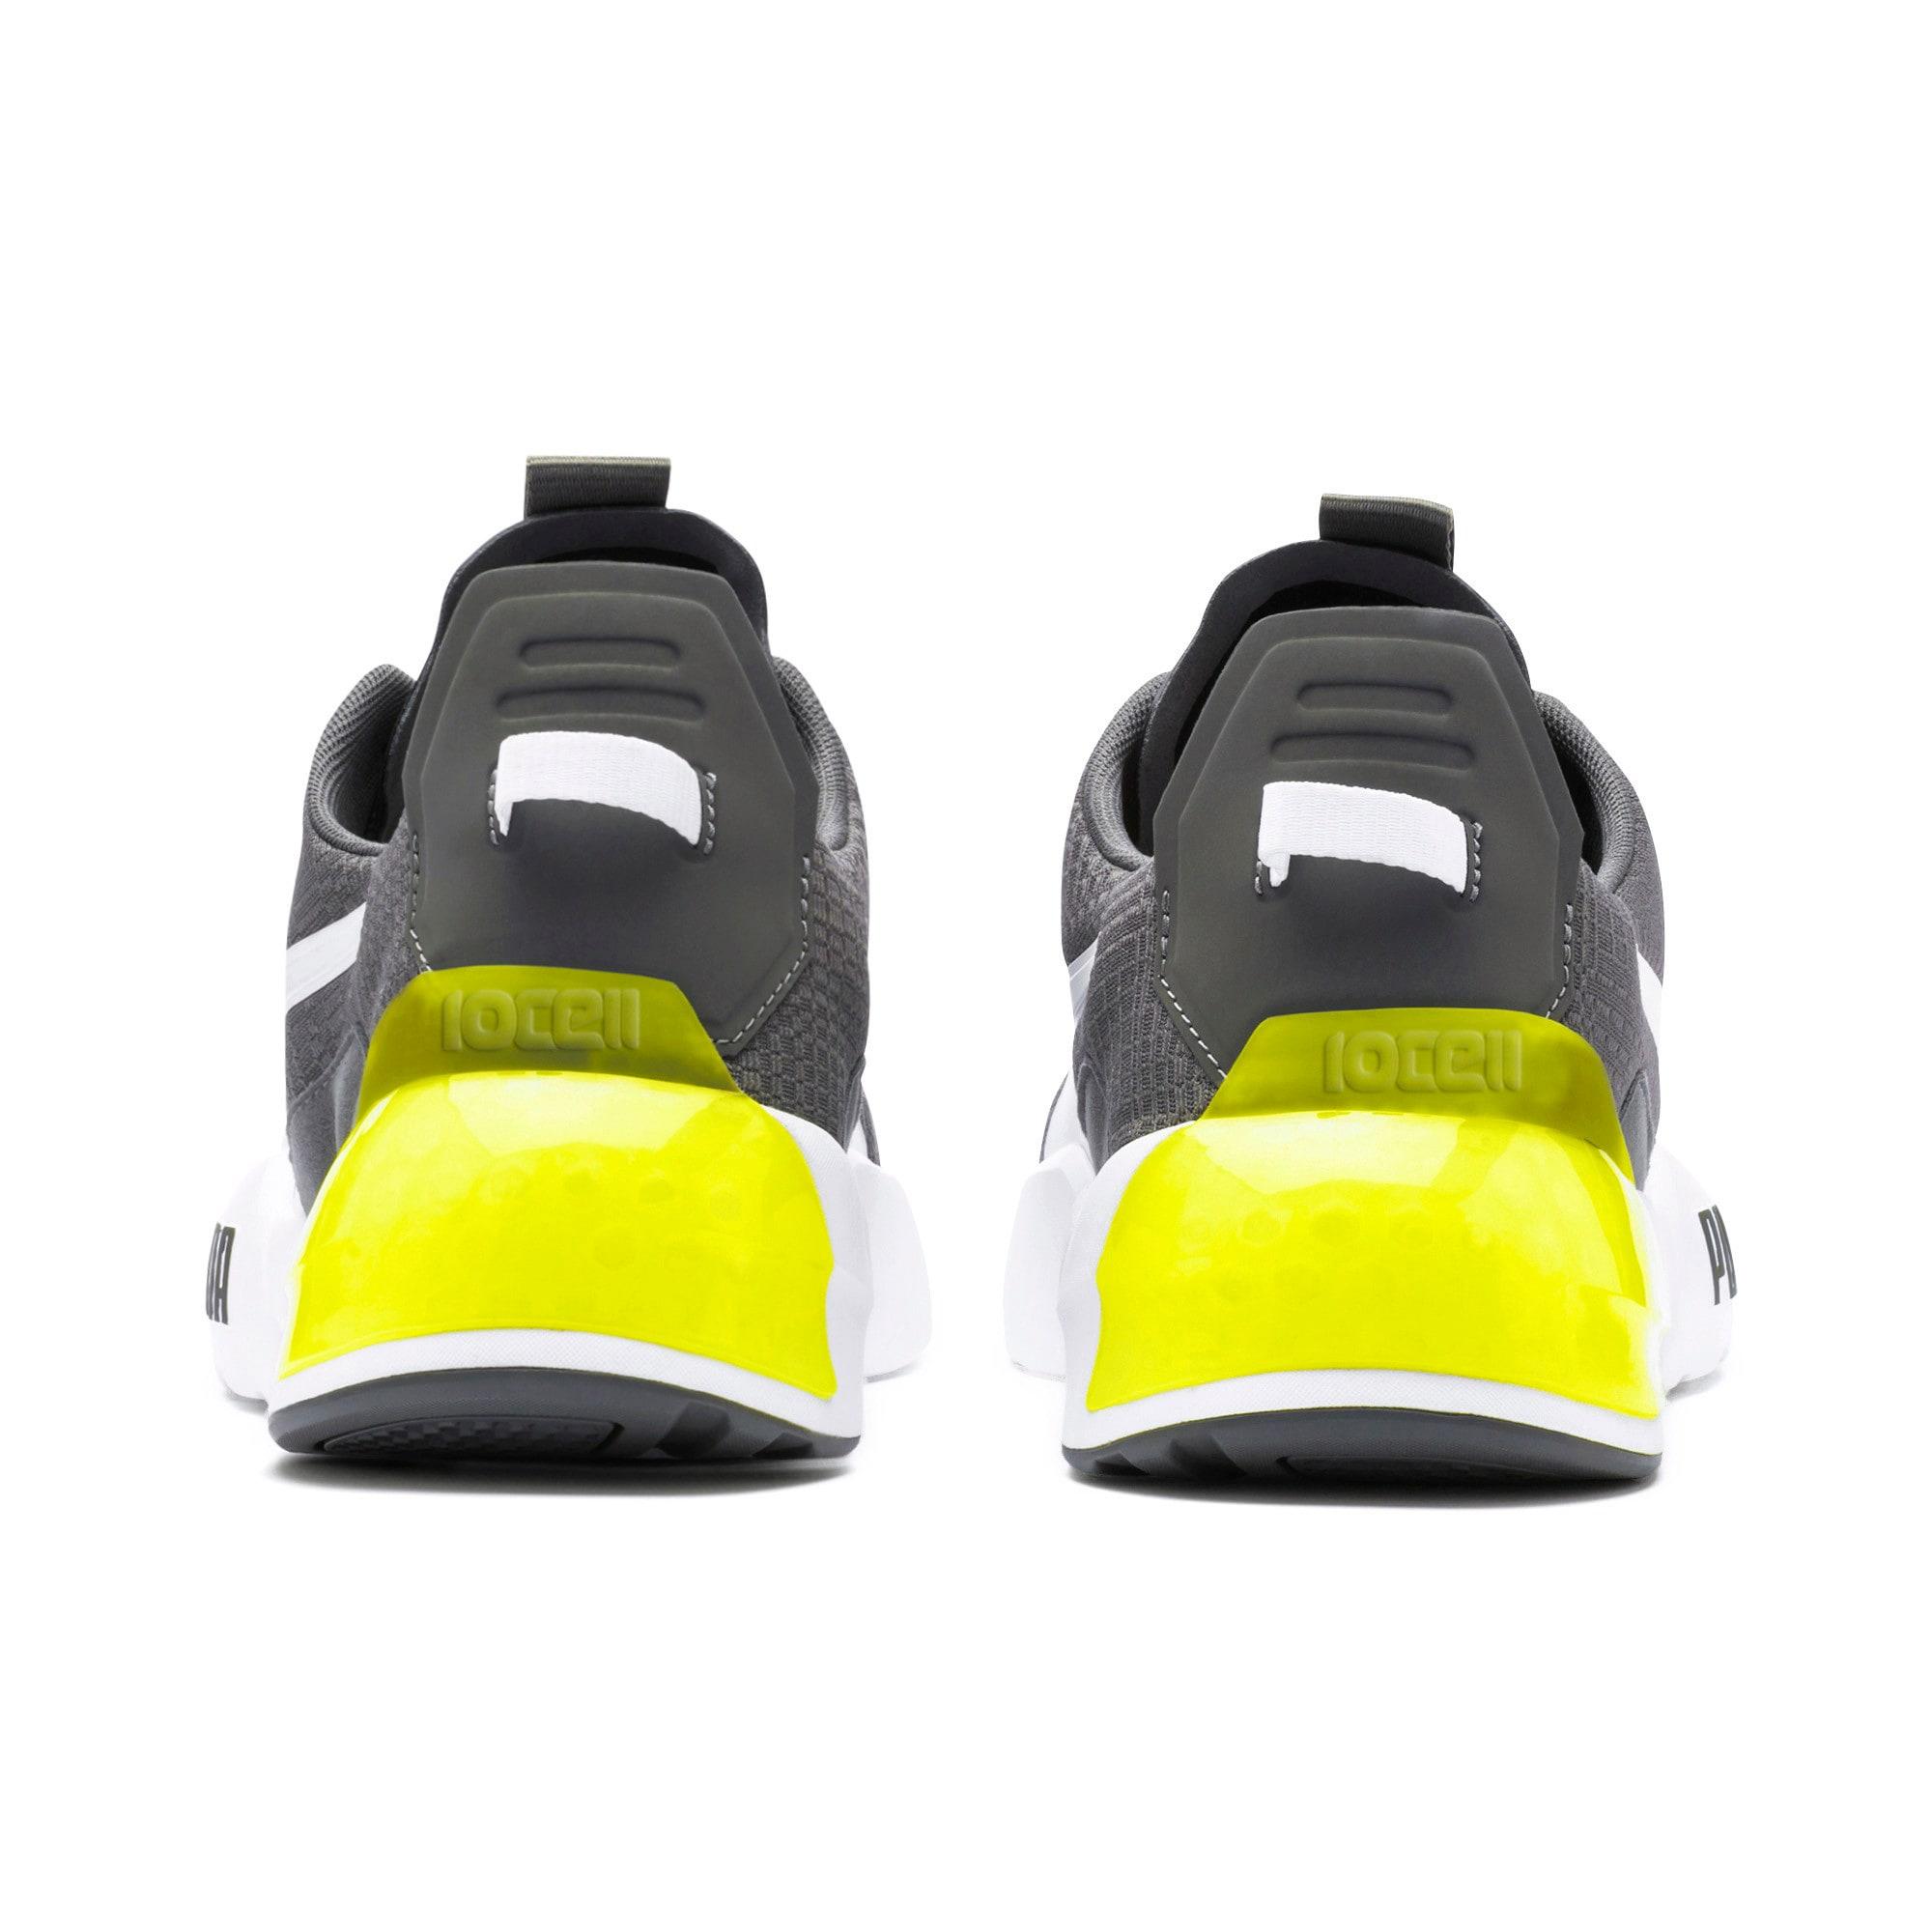 Thumbnail 5 of CELL Phase Lights Men's Training Shoes, CASTLEROCK-Yellow Alert, medium